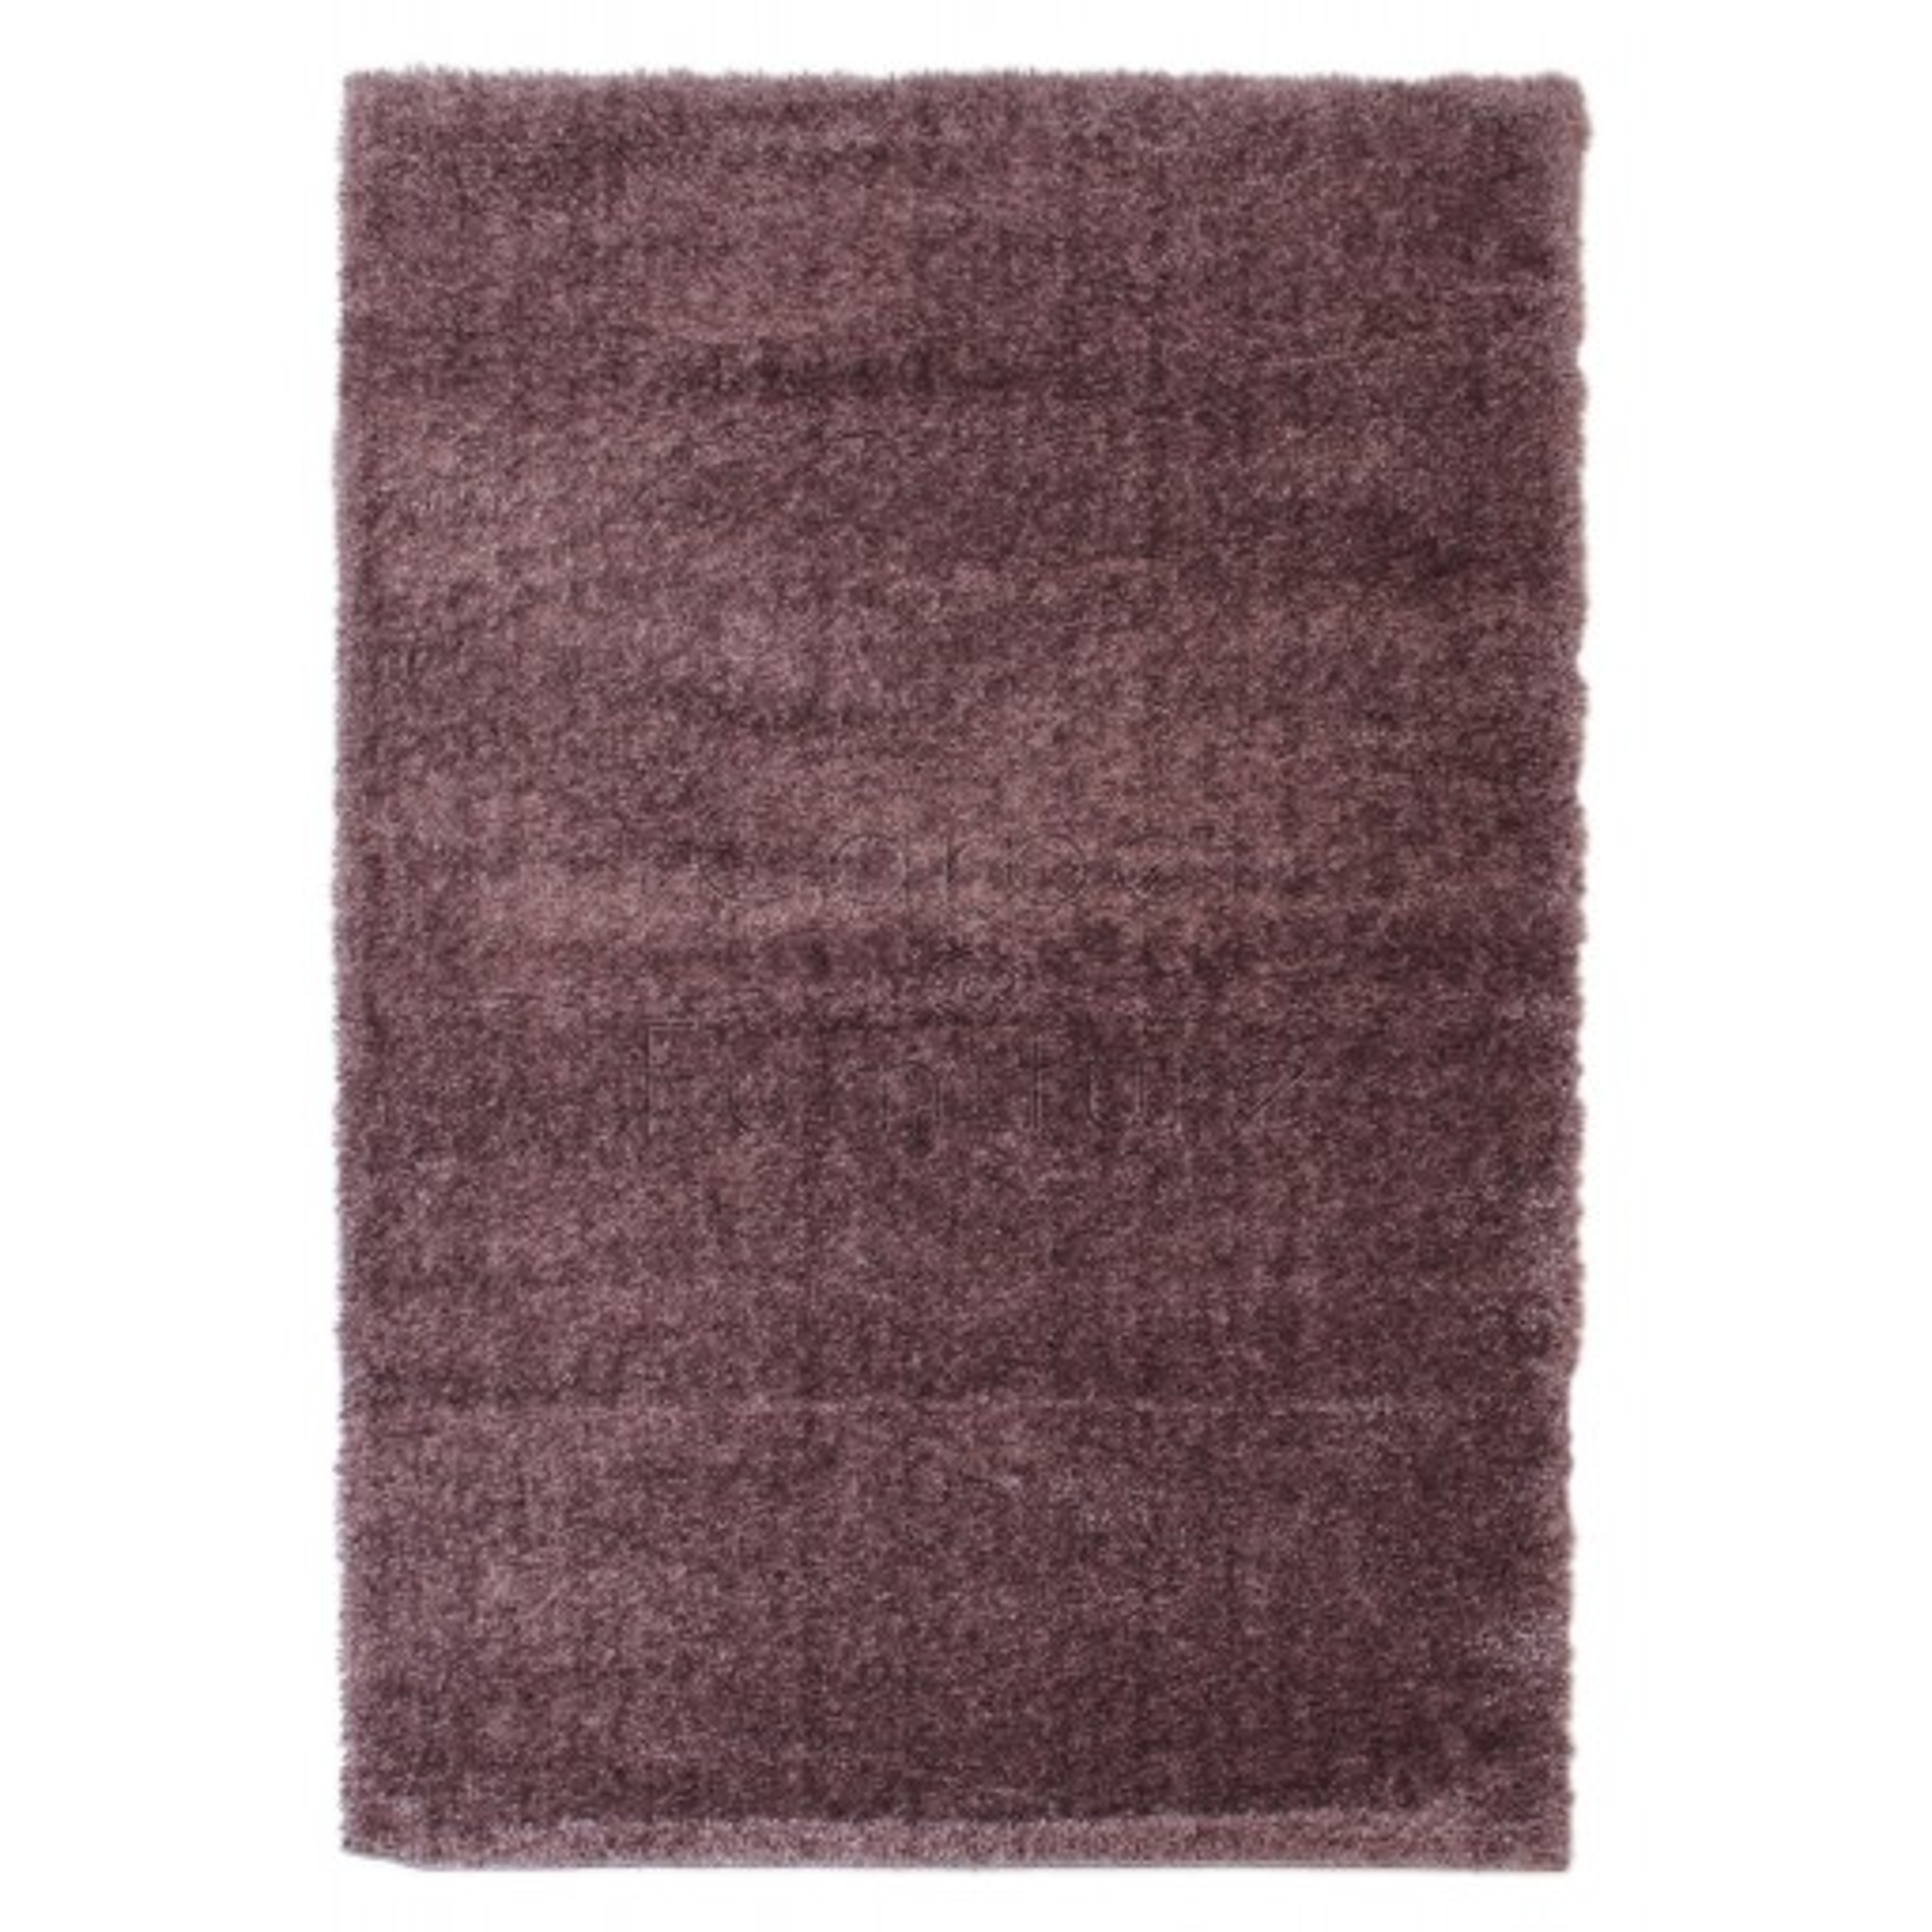 "Velvet Shaggy Rug - Mauve - Size 80 x 150 cm (2'8"" x 5')"